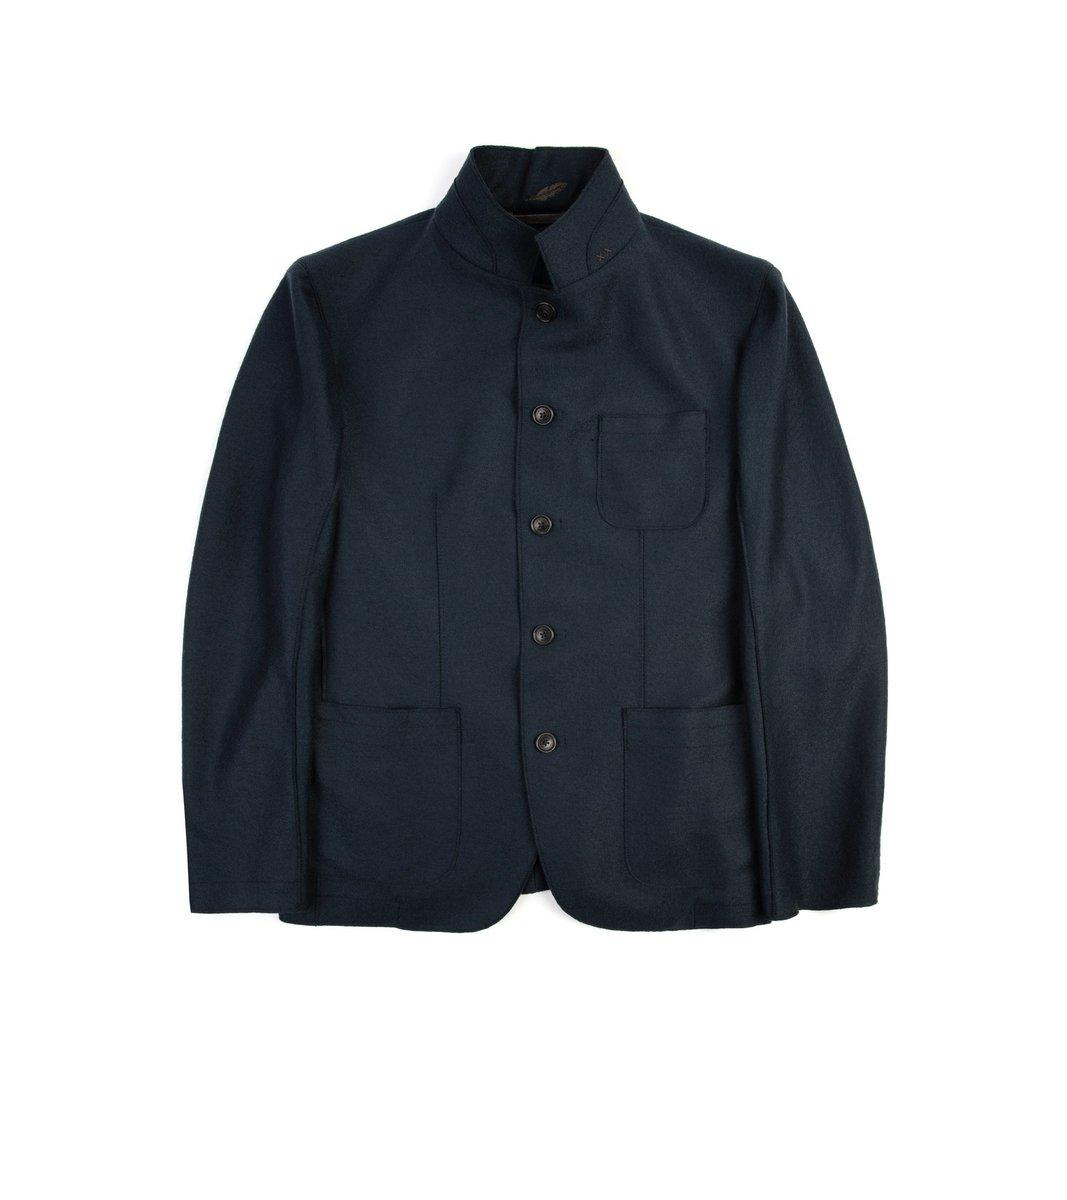 Weber_Weber-Boiled-Wool-WW-Travel-Blazer-MidnightBlue-1LR_1920x.jpg